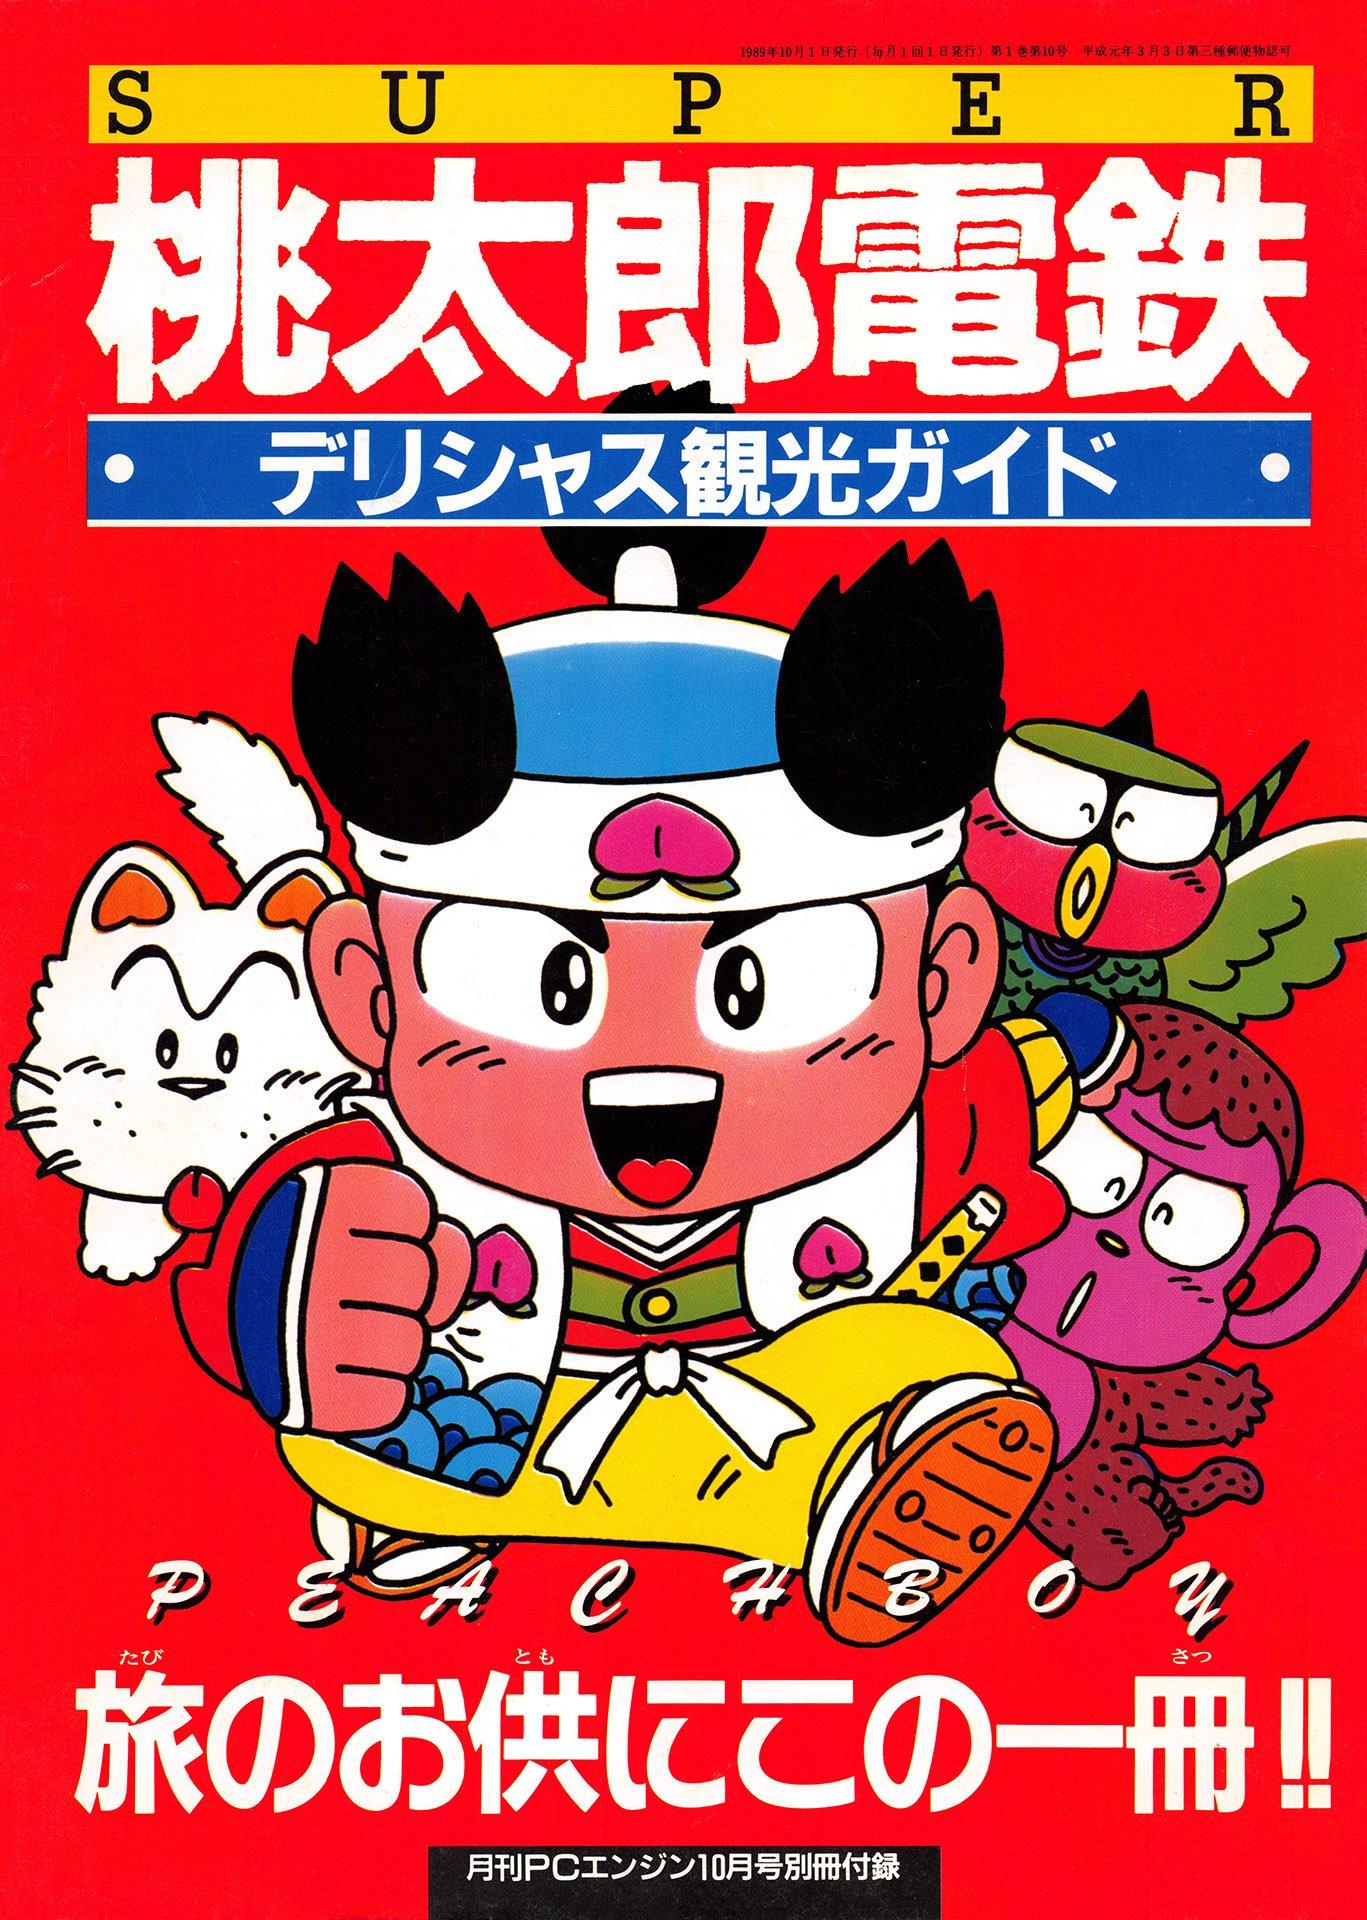 Super Momotarou Dentetsu  - Delicious Kankou Guide (Gekkan PC Engine issue 10 supplement) (October 1989)